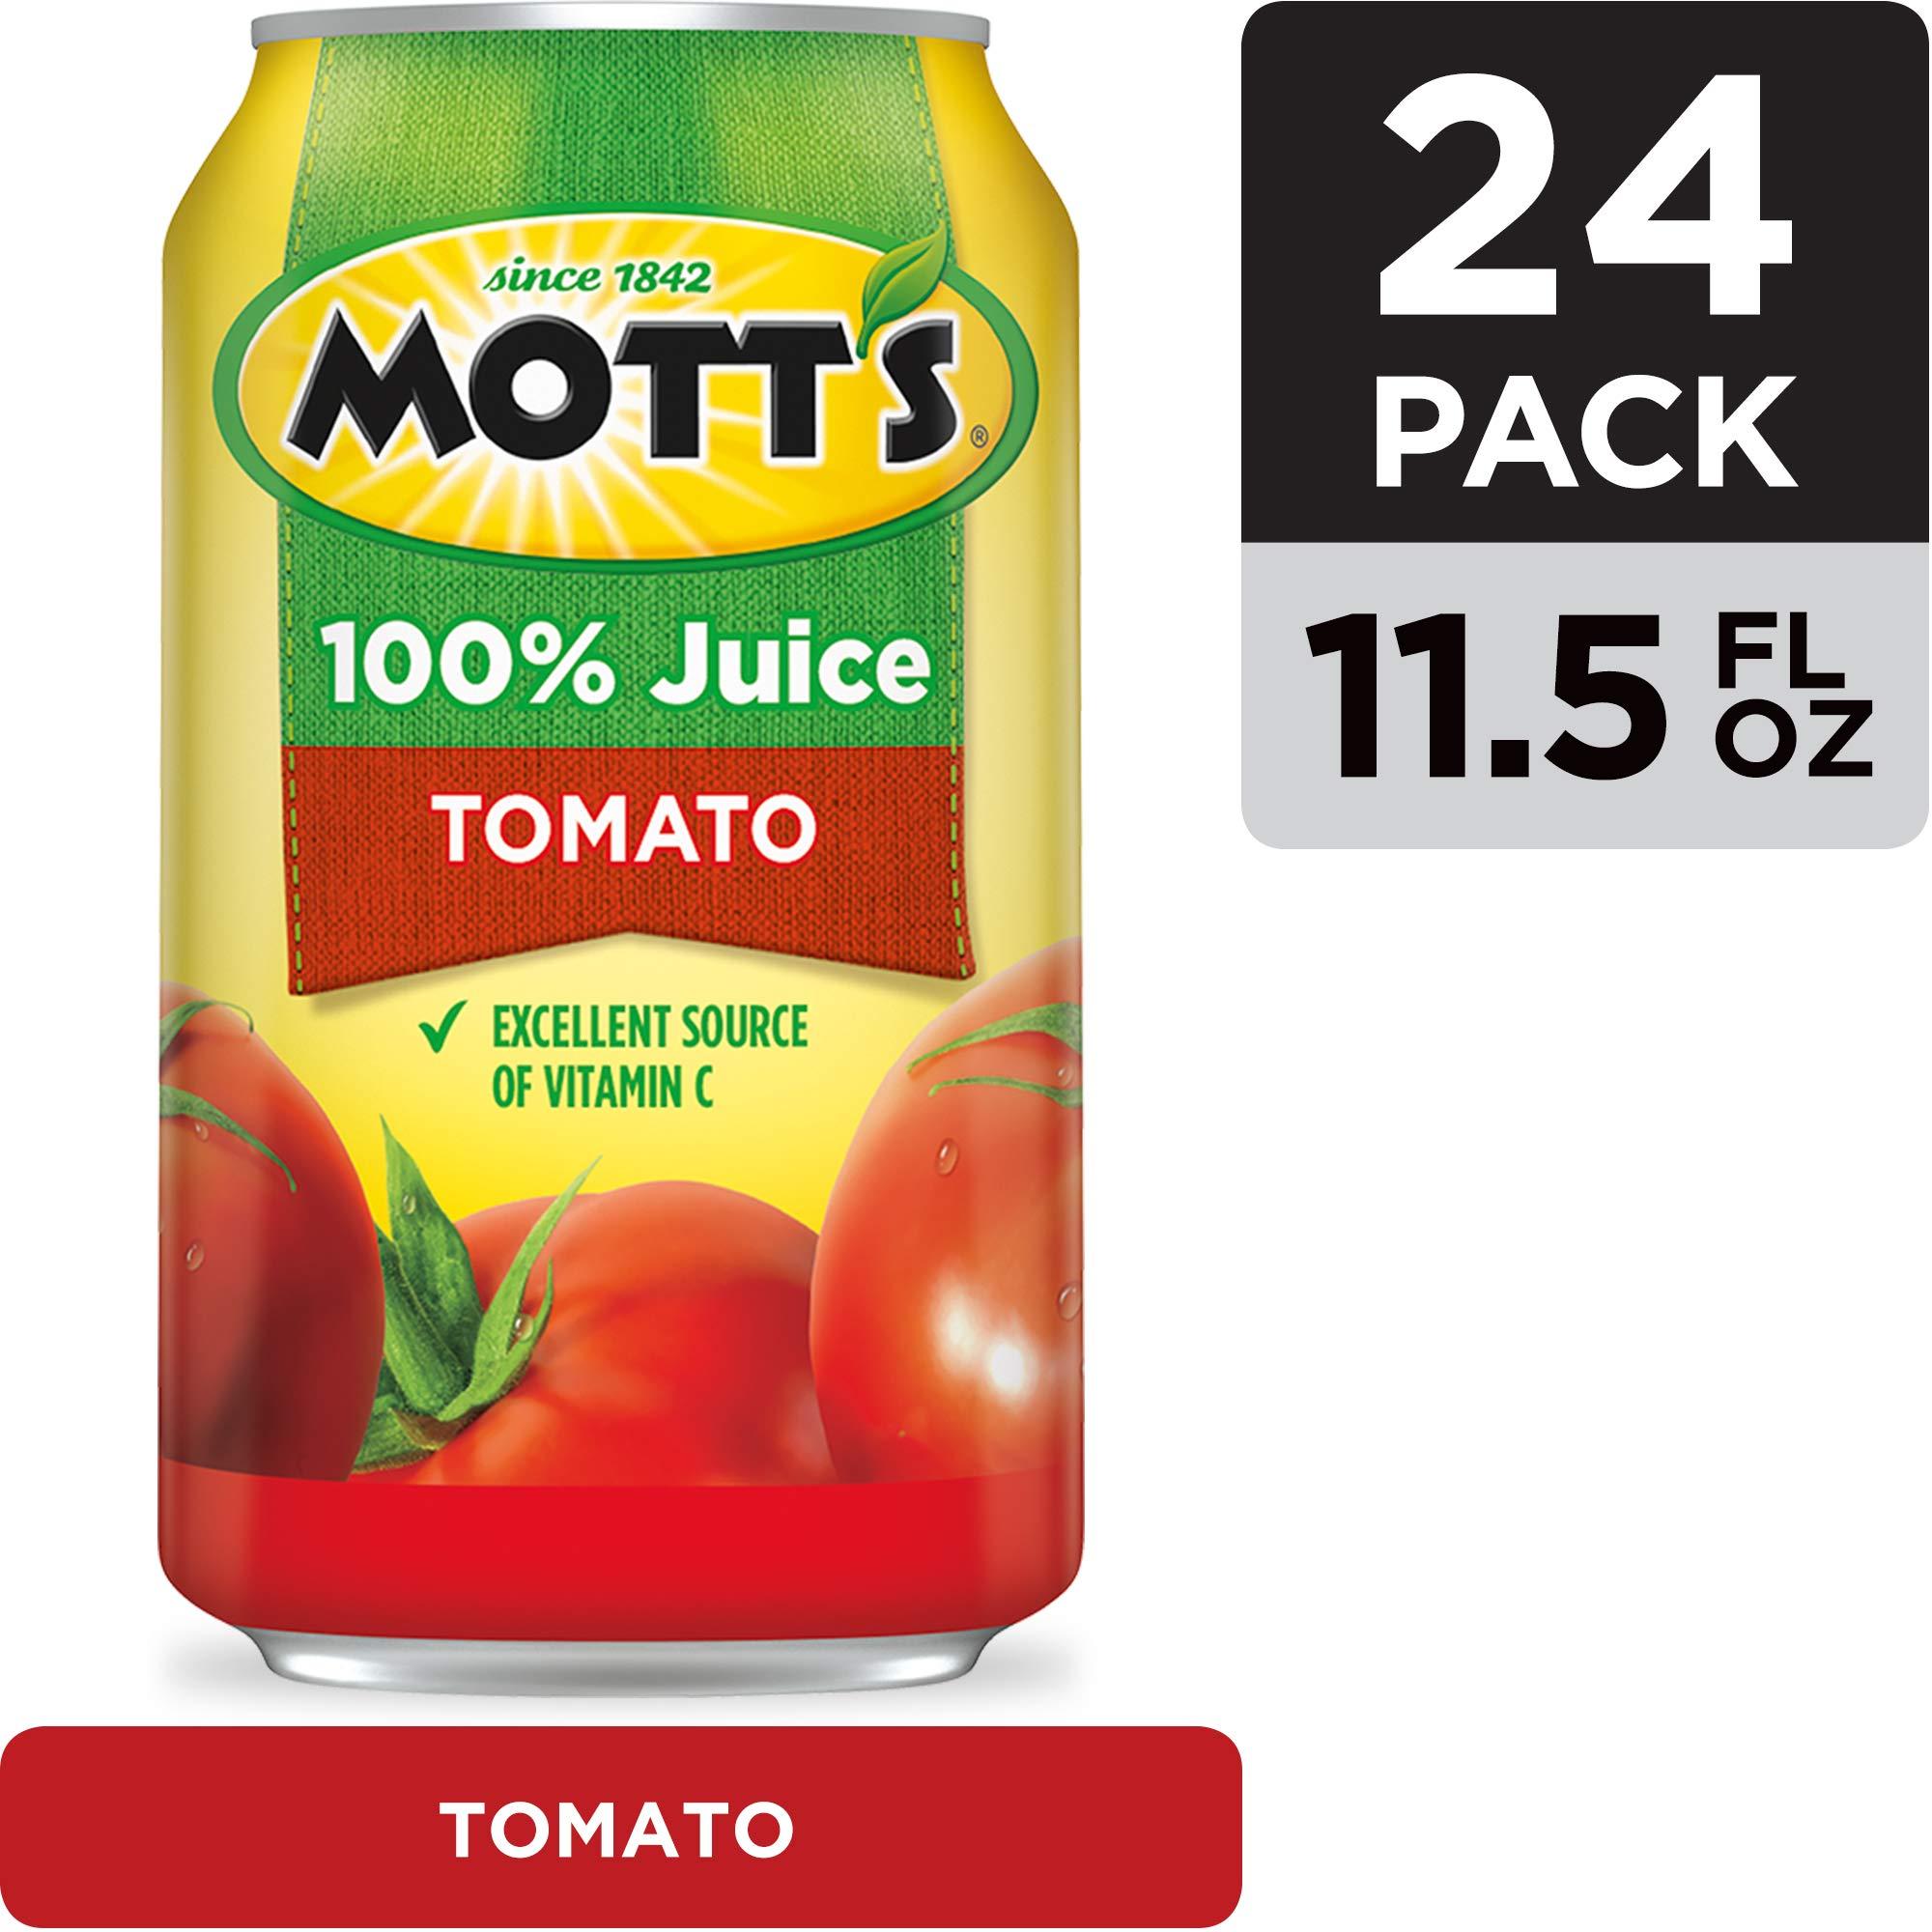 Mott's 100% Tomato Juice, 11.5 Fluid Ounce Can, 24 Count by Mott's